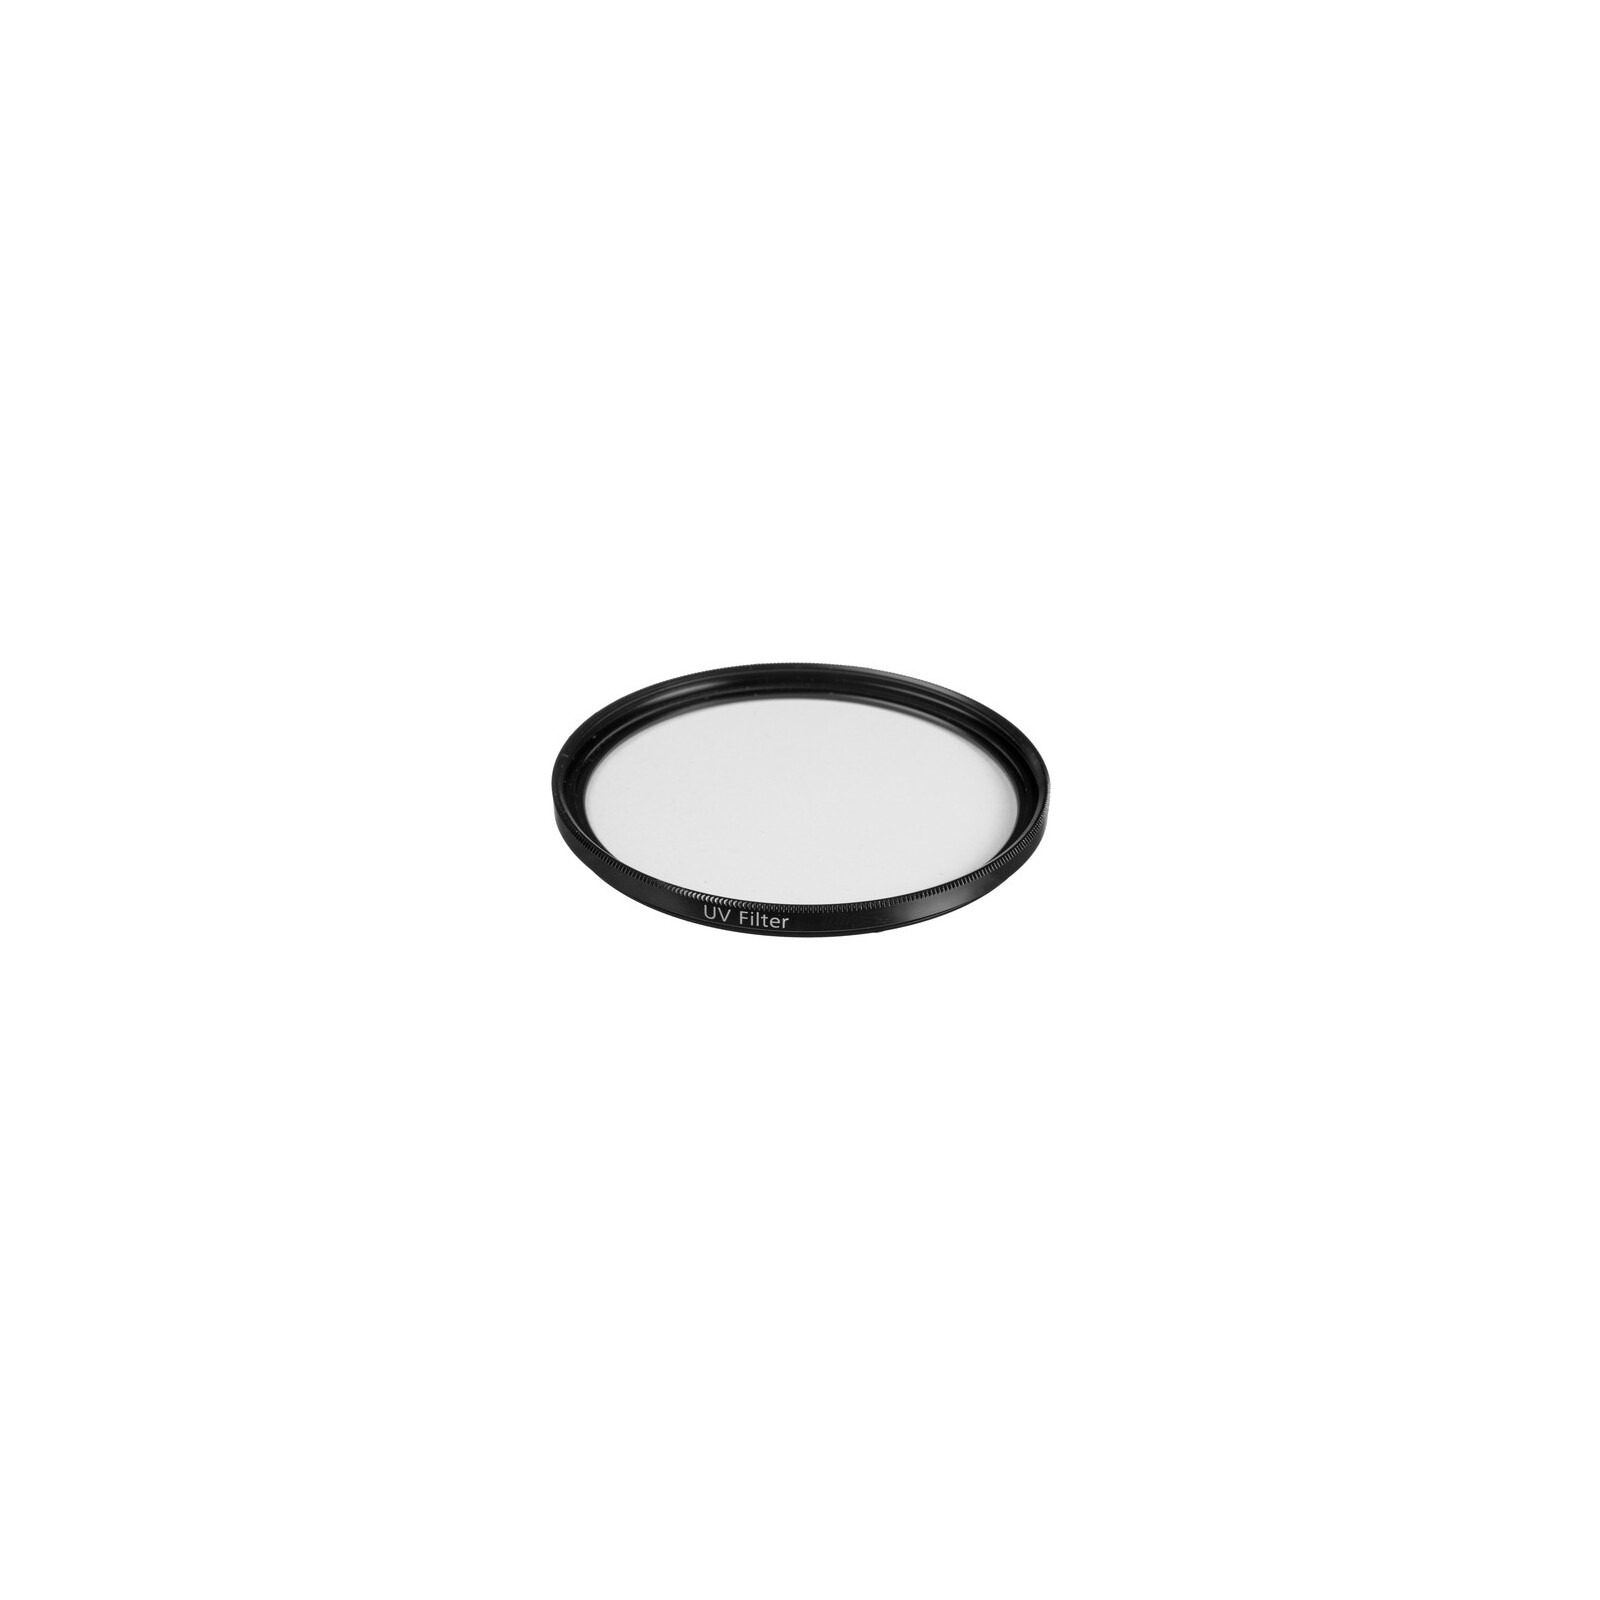 Zeiss T* UV Filter 86mm